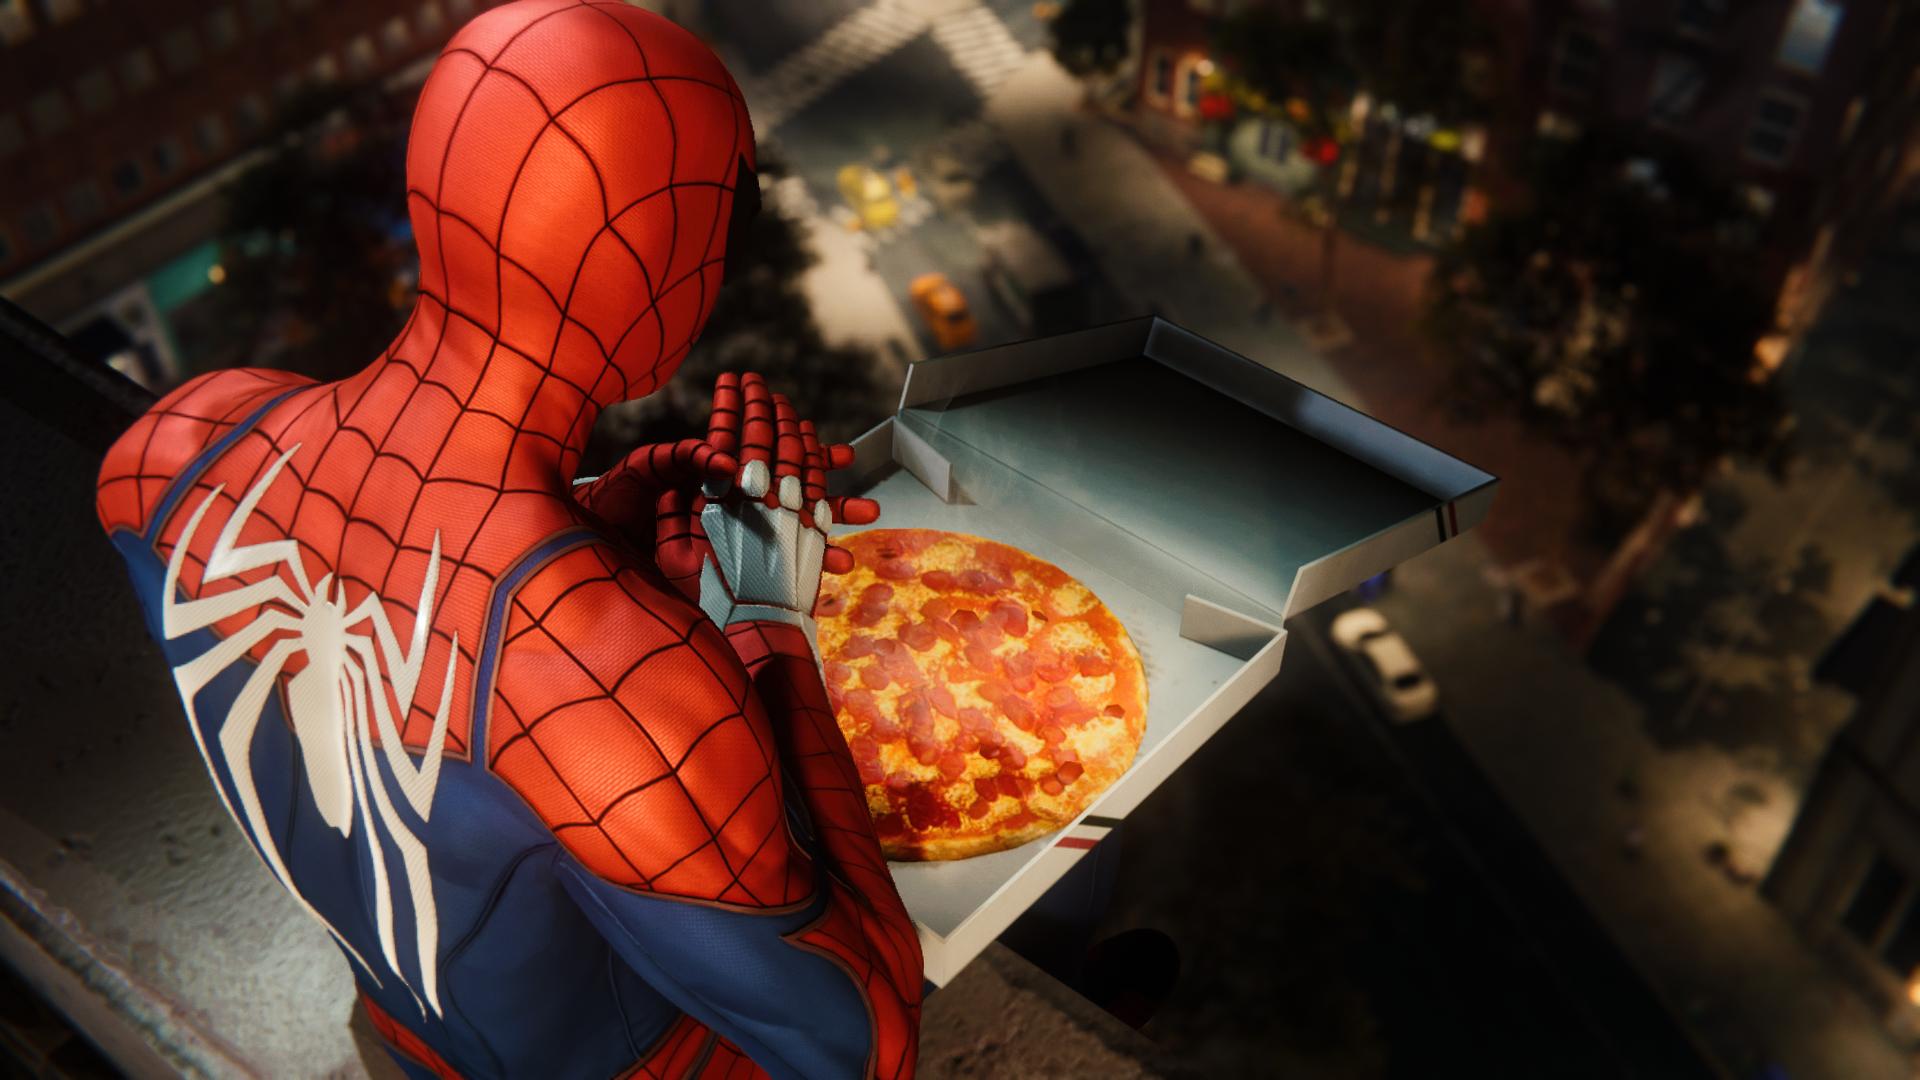 La Pizza in Spider-Man Miles Morales